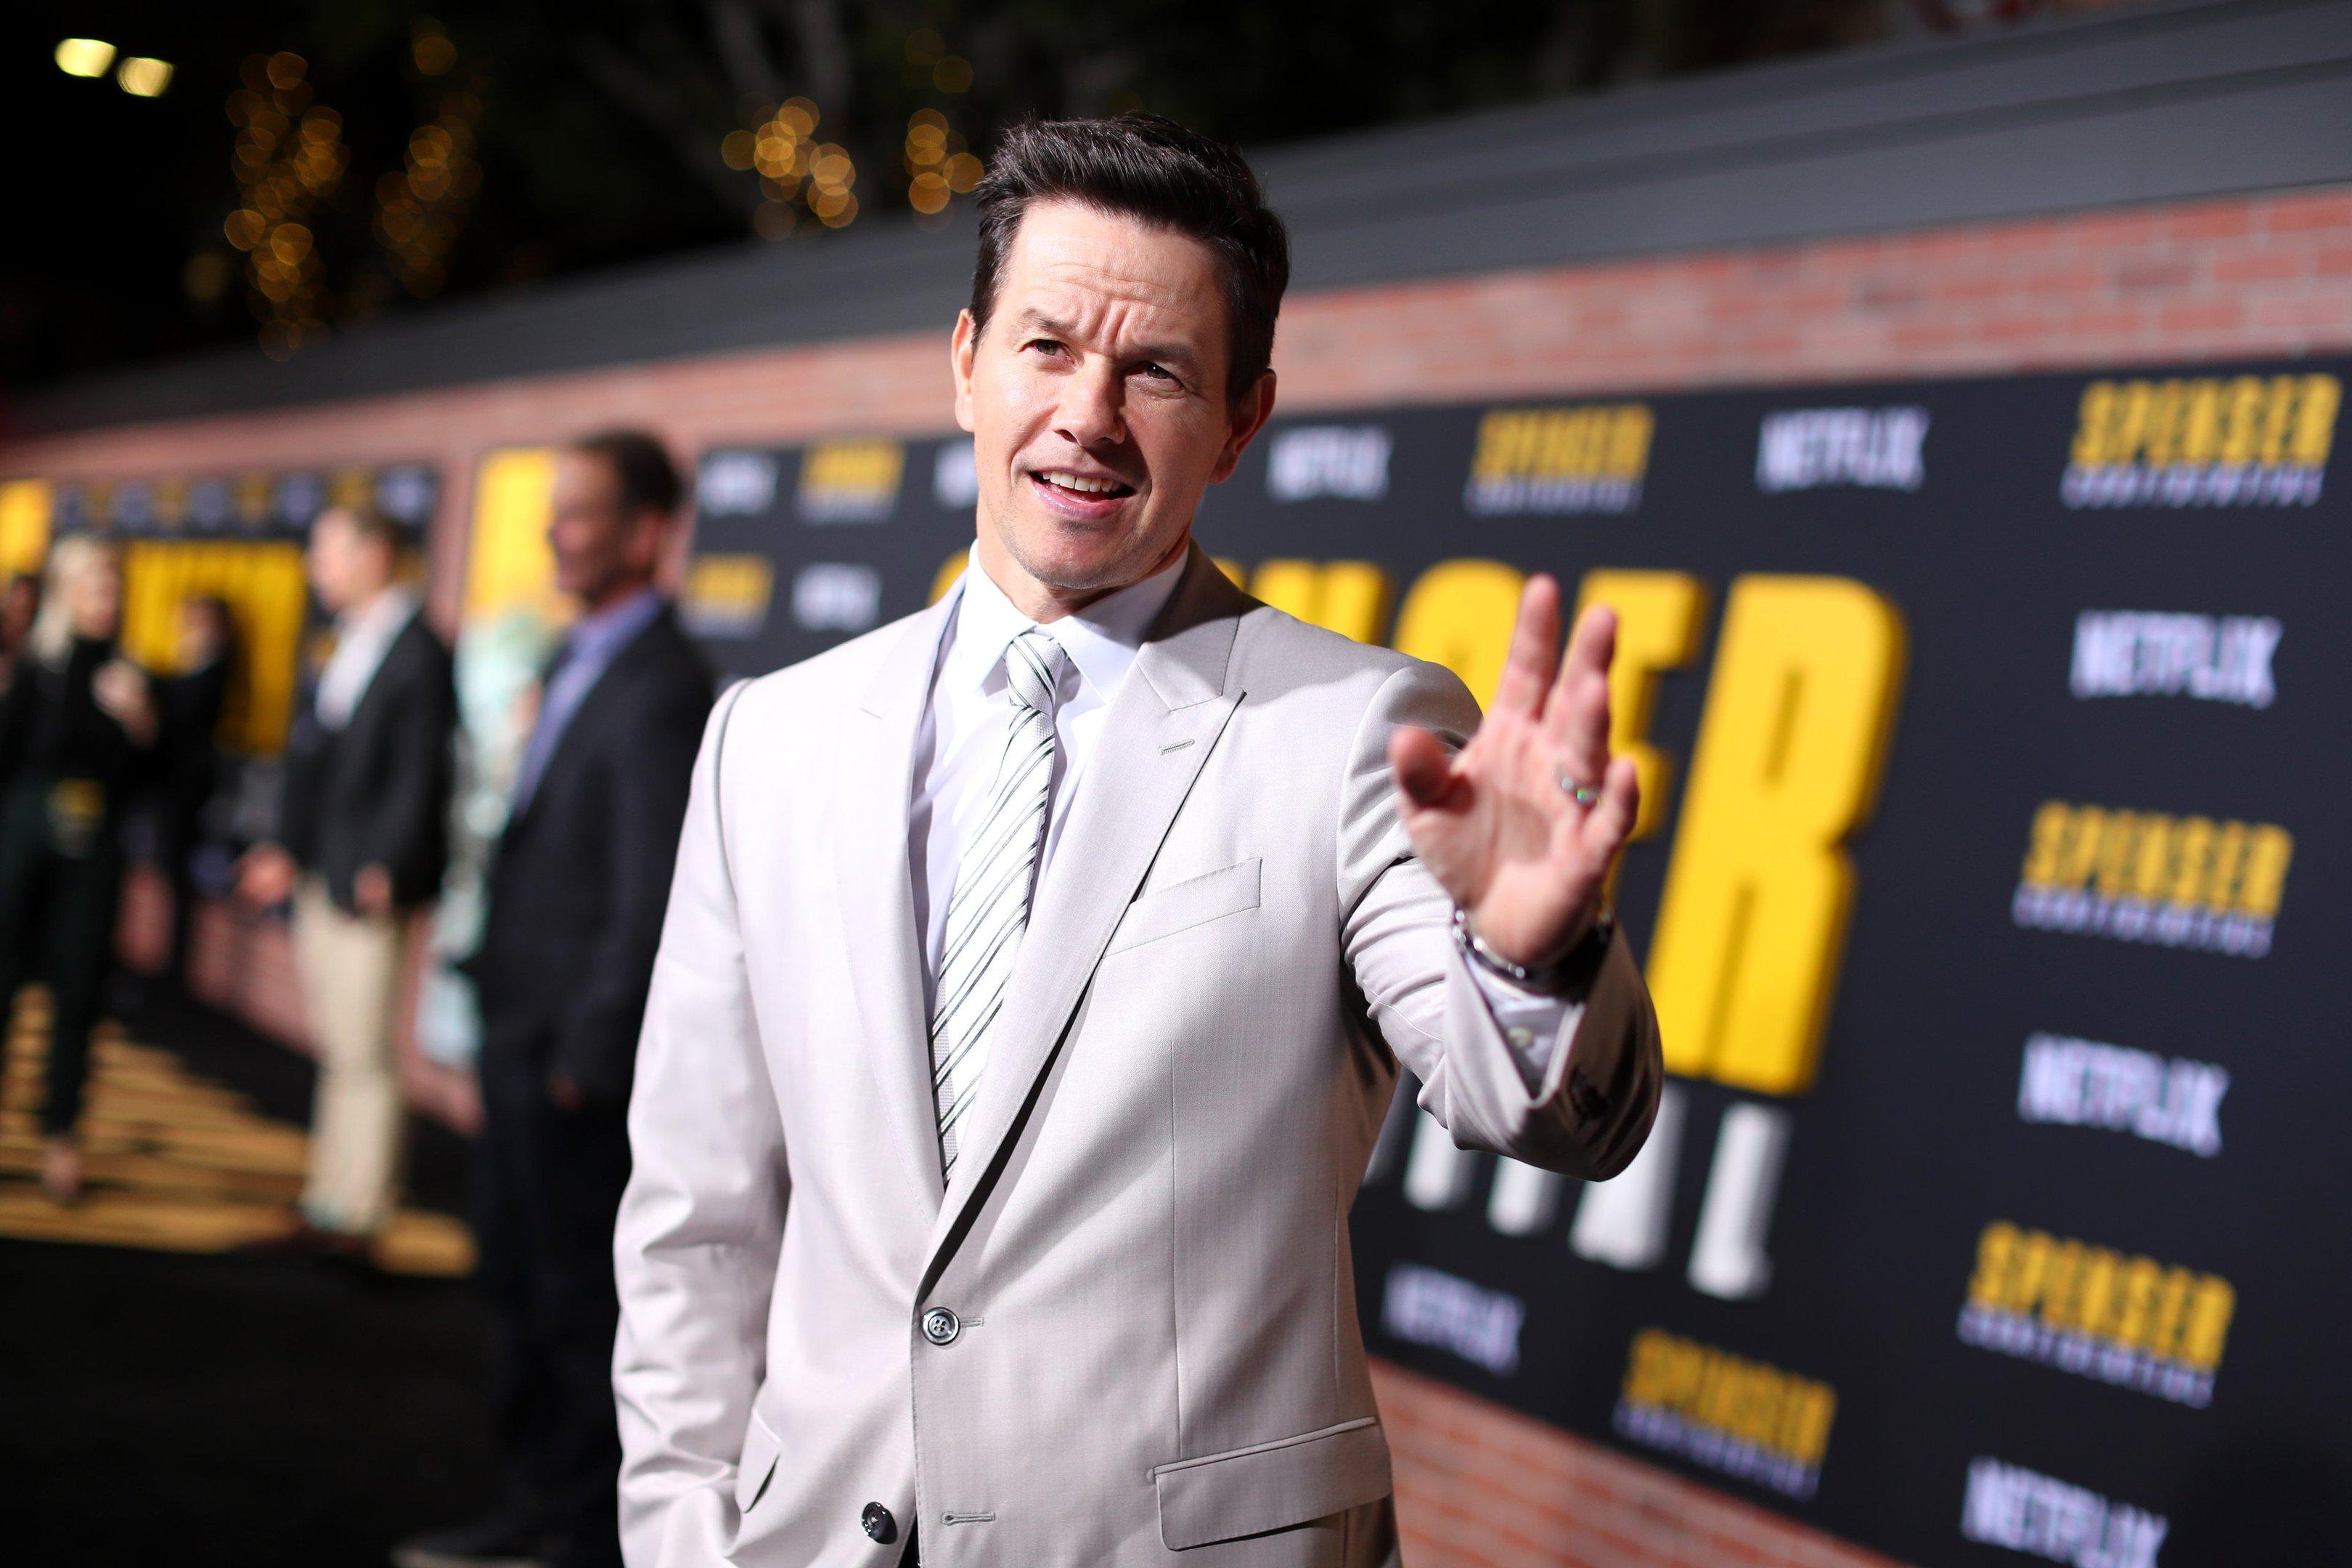 O ator Mark Wahlberg